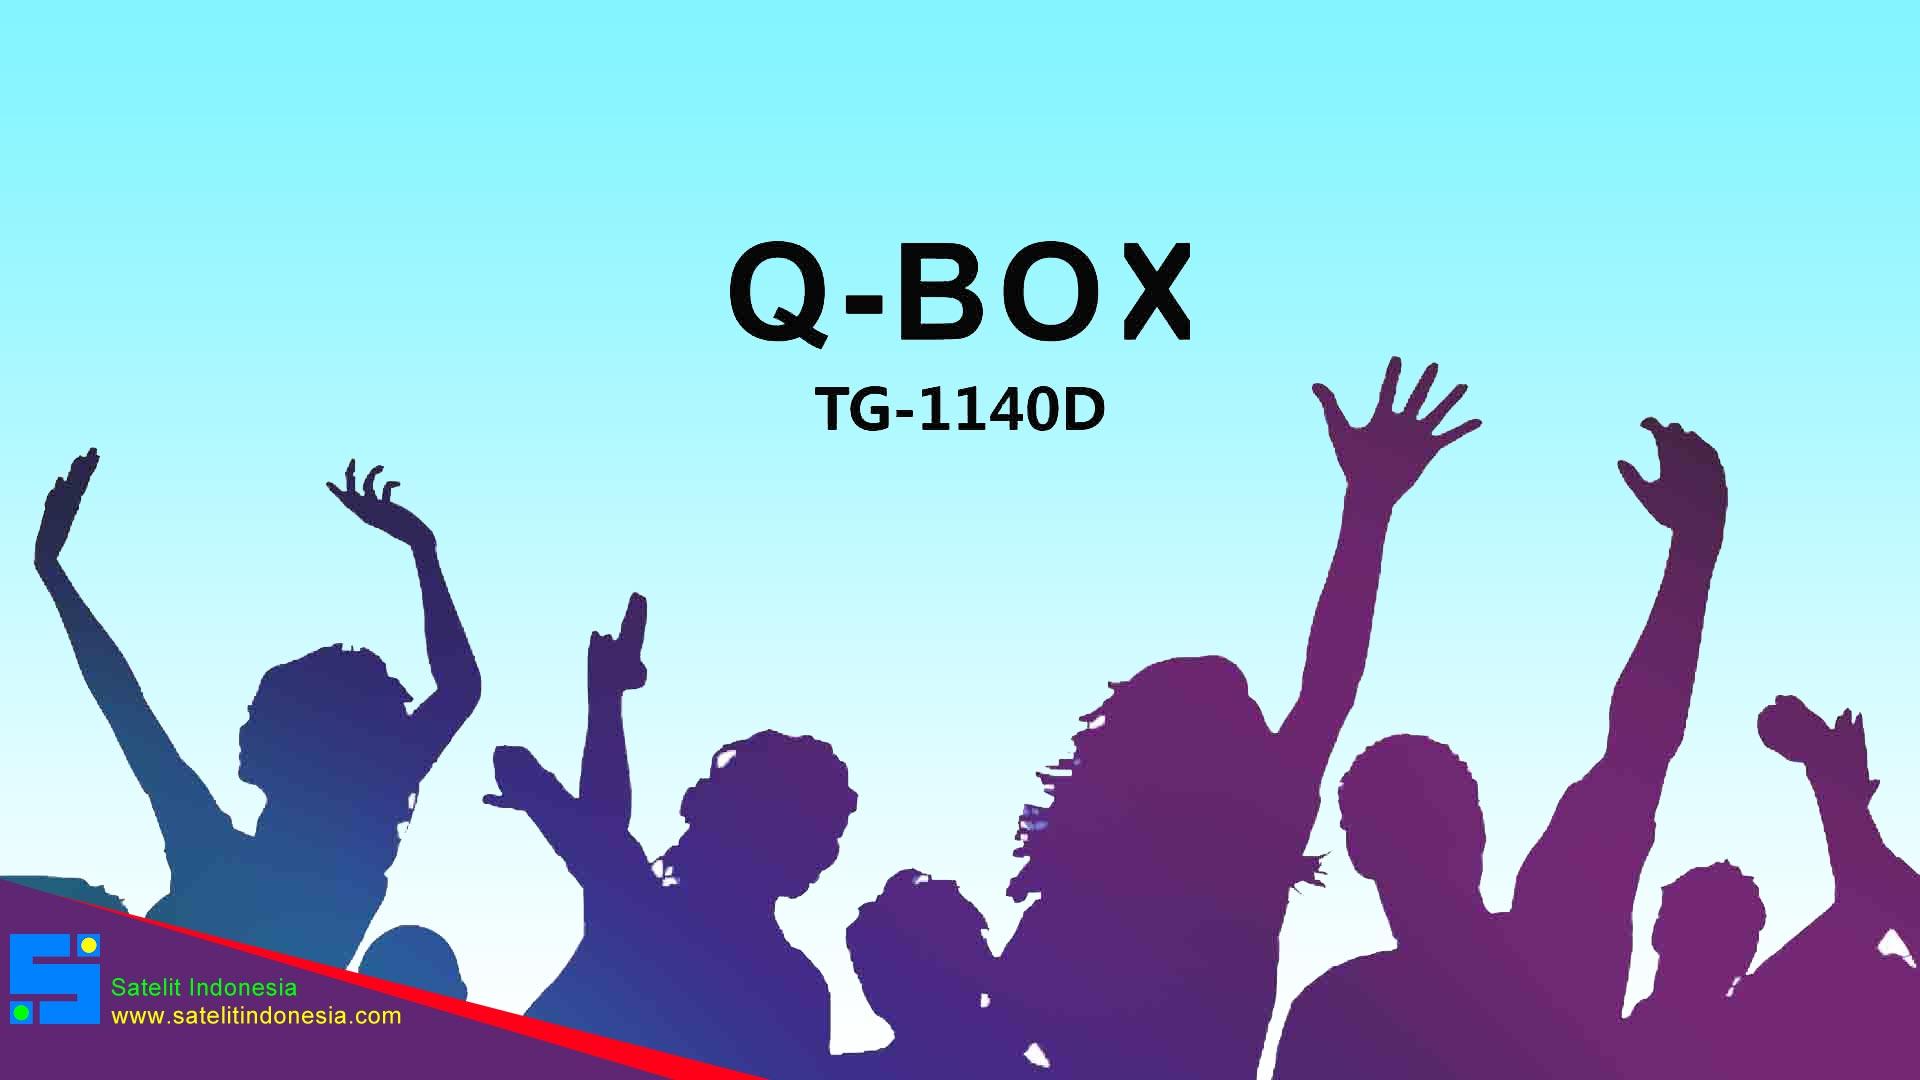 Download Firmware Q-Box TG 1140D New Update Software Terbaru